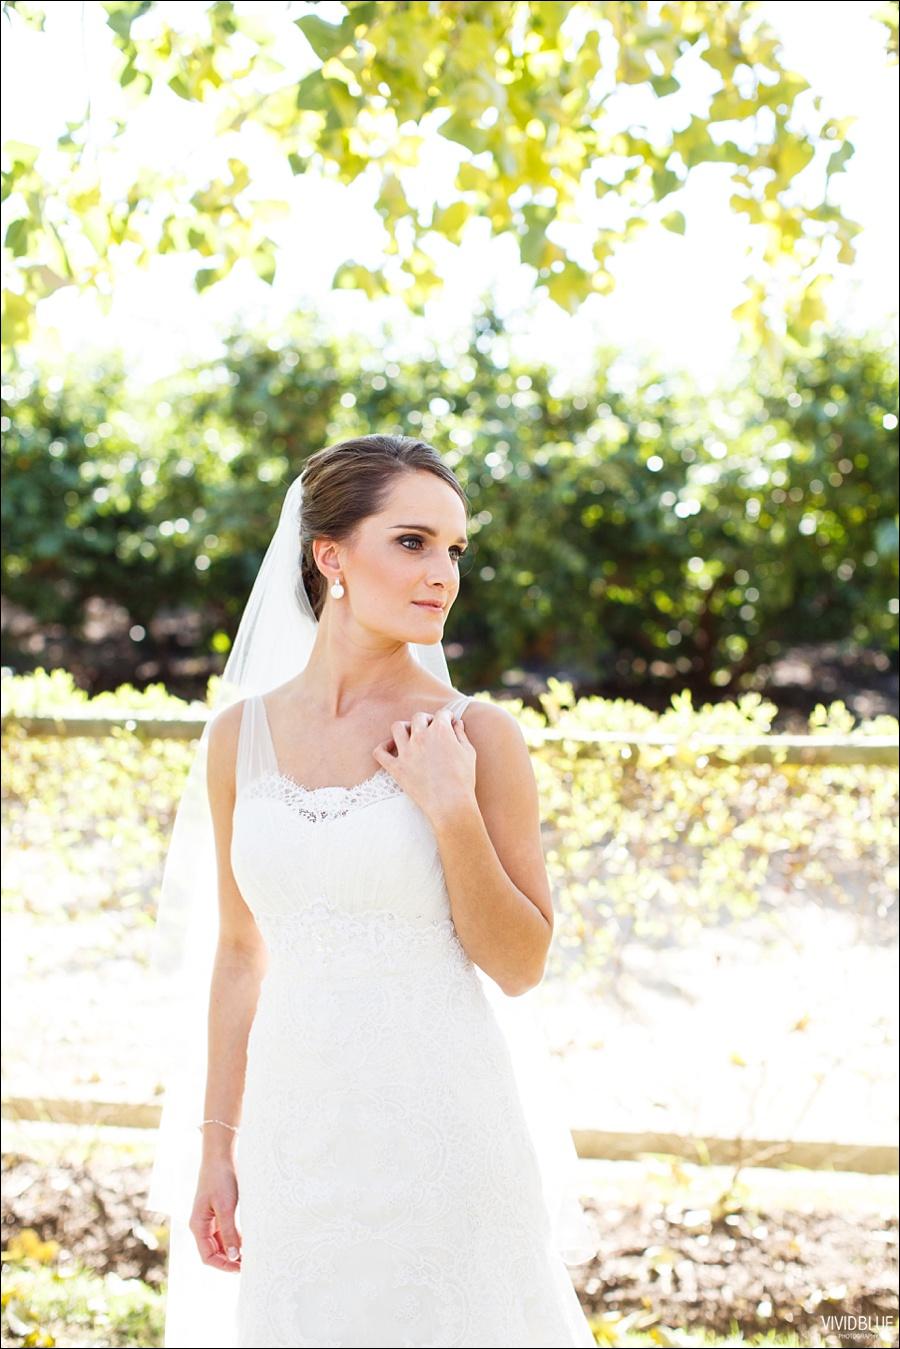 VividBlue-philip-anlika-kleinevalleij-wedding042